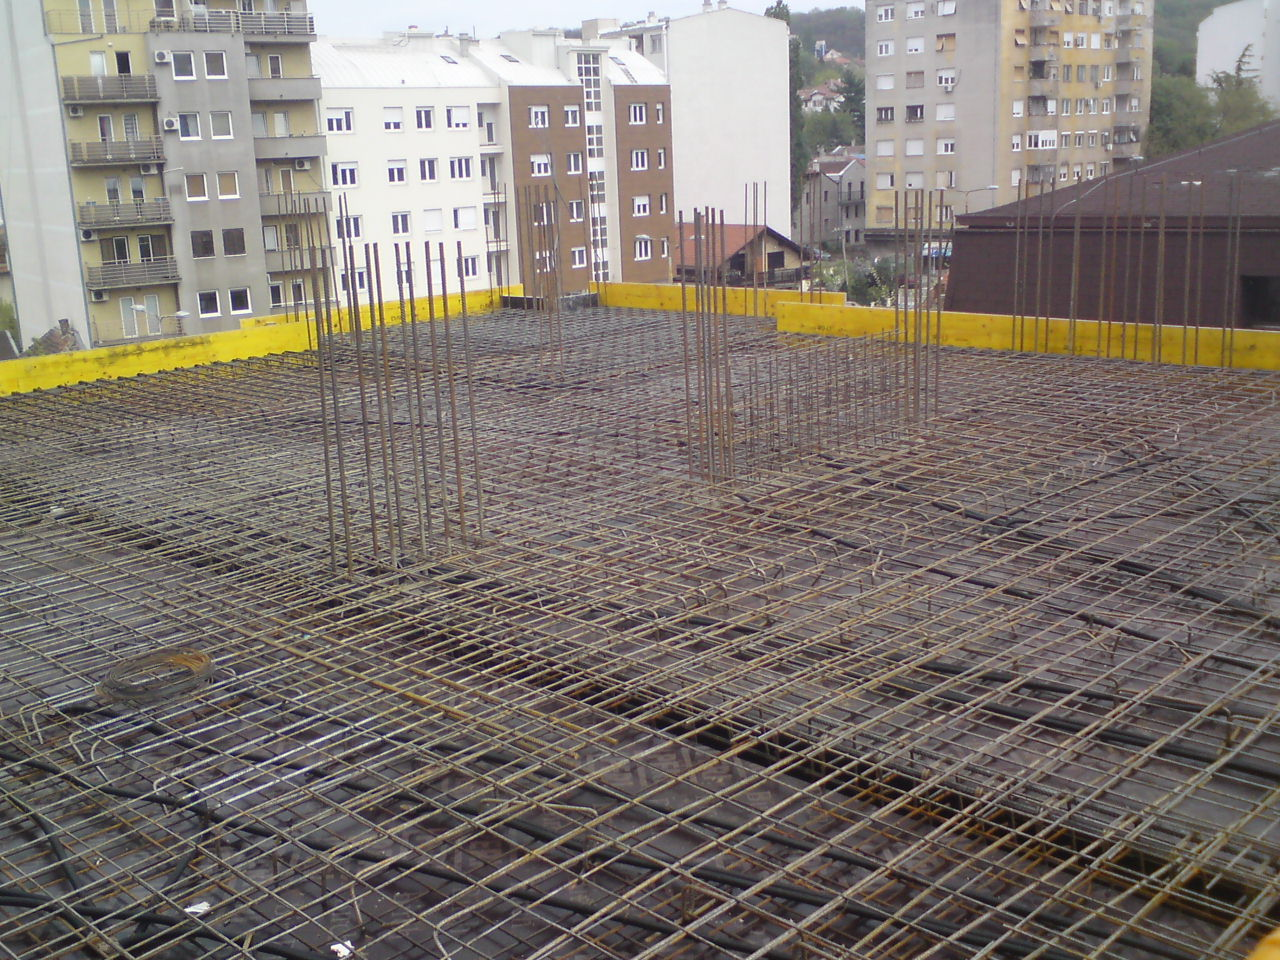 2b854b5eec77 Concrete slab 3rd floor